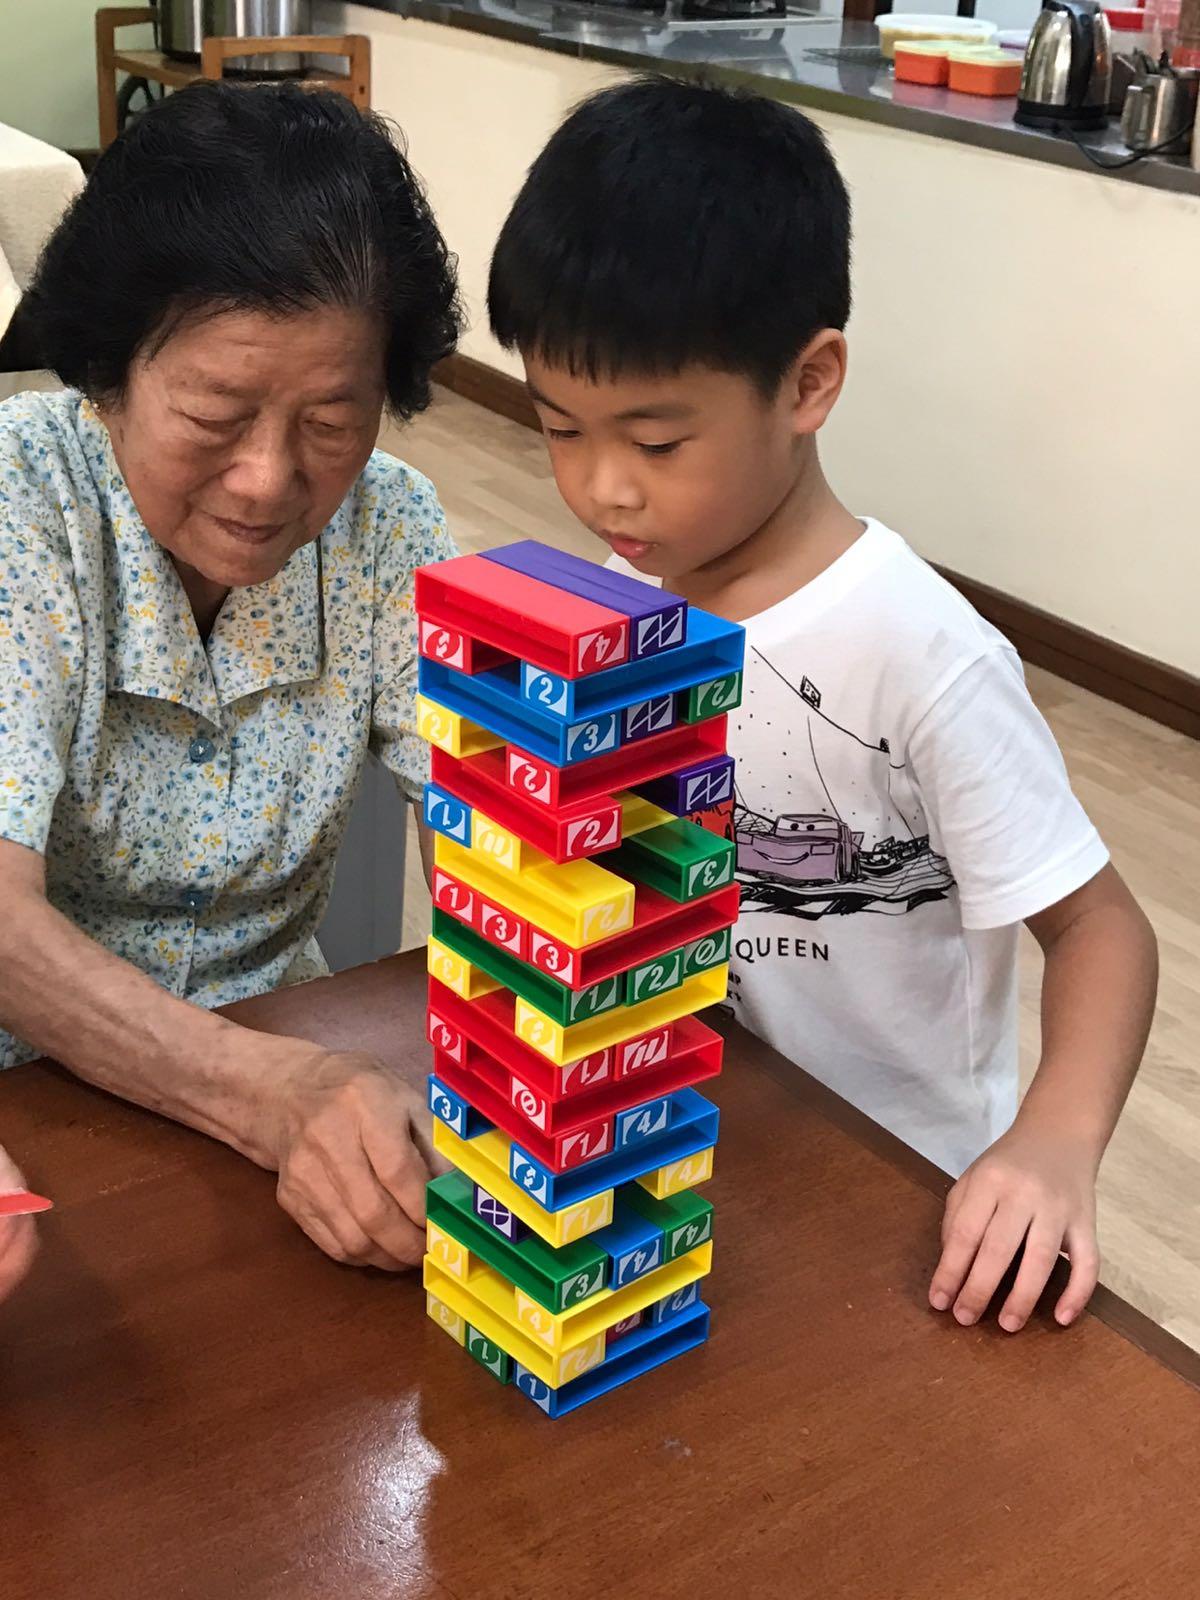 Inter-Generational Bonding - Play Jenga